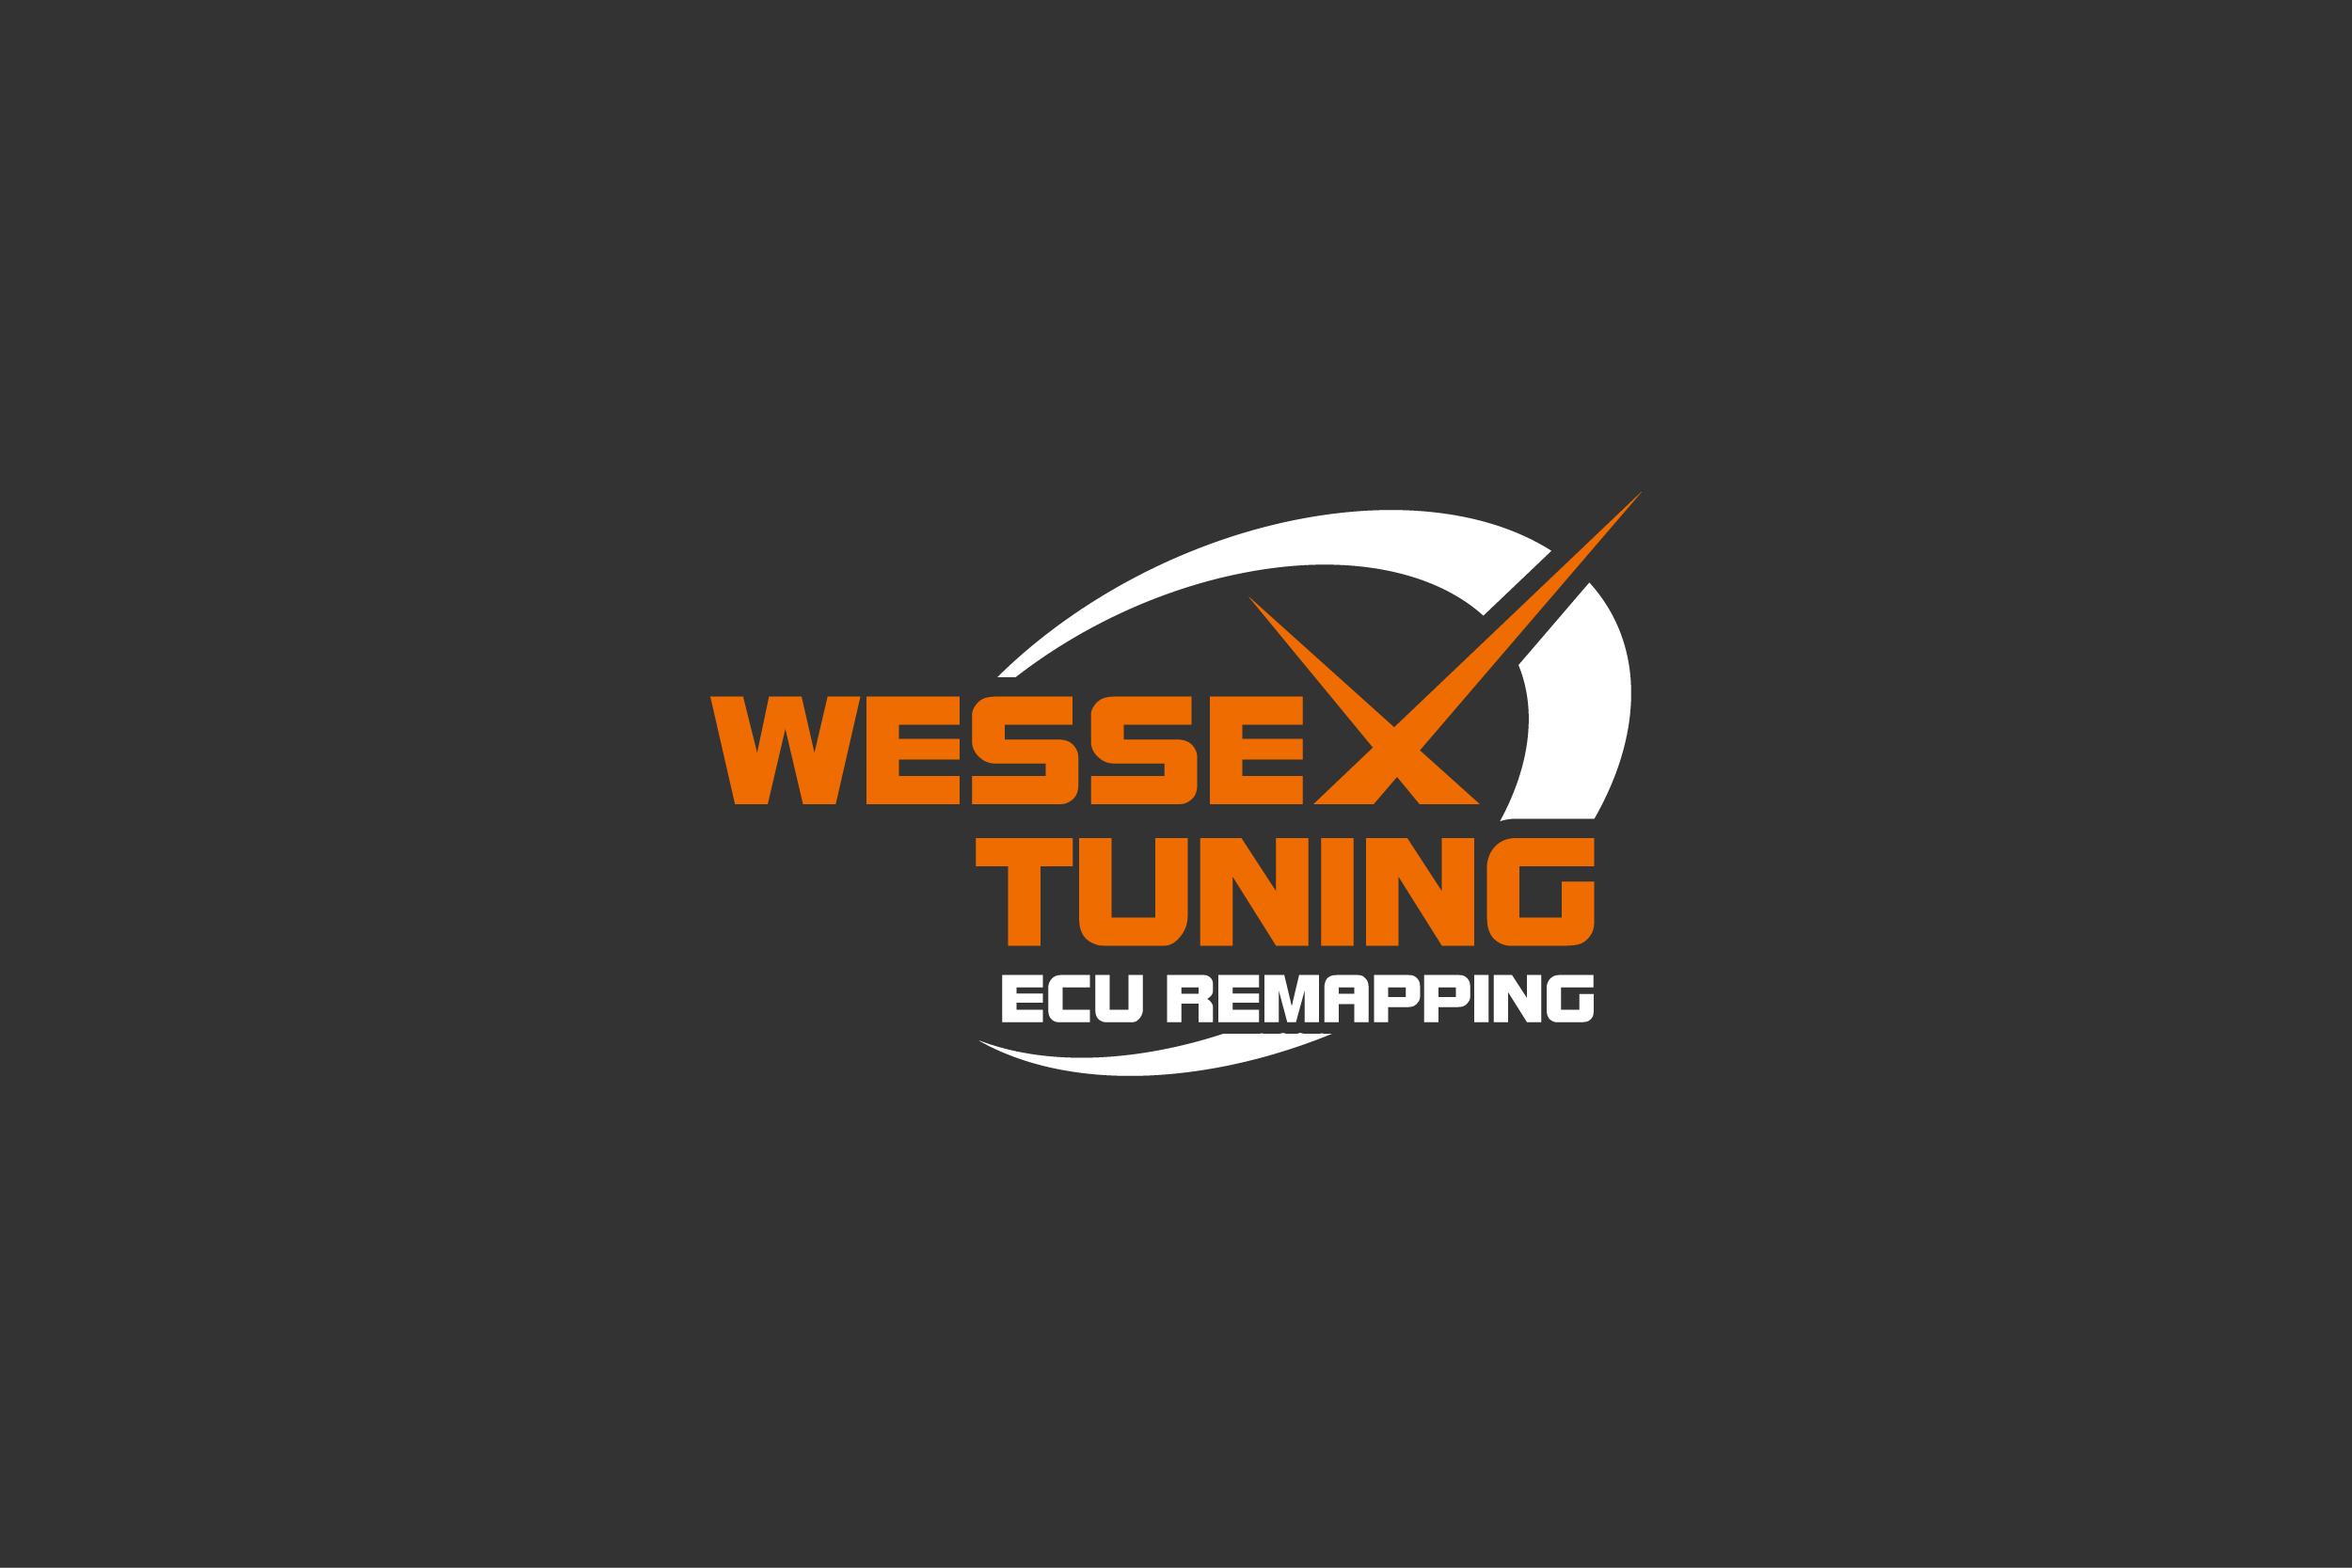 Wessex Tuning